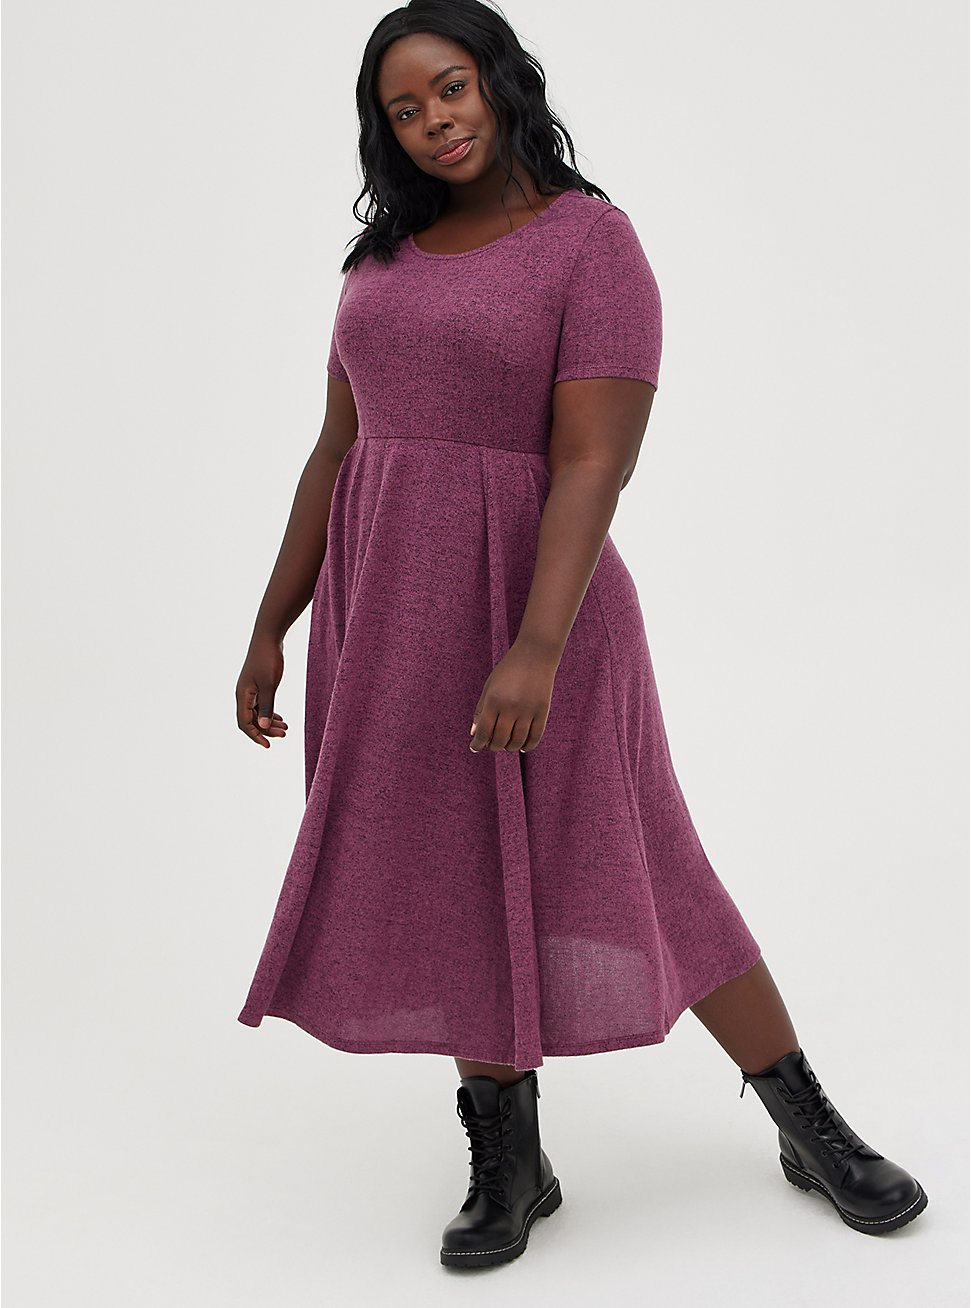 Midi Skater Dress - Super Soft Plush Dark Purple, BURGUNDY, hi-res